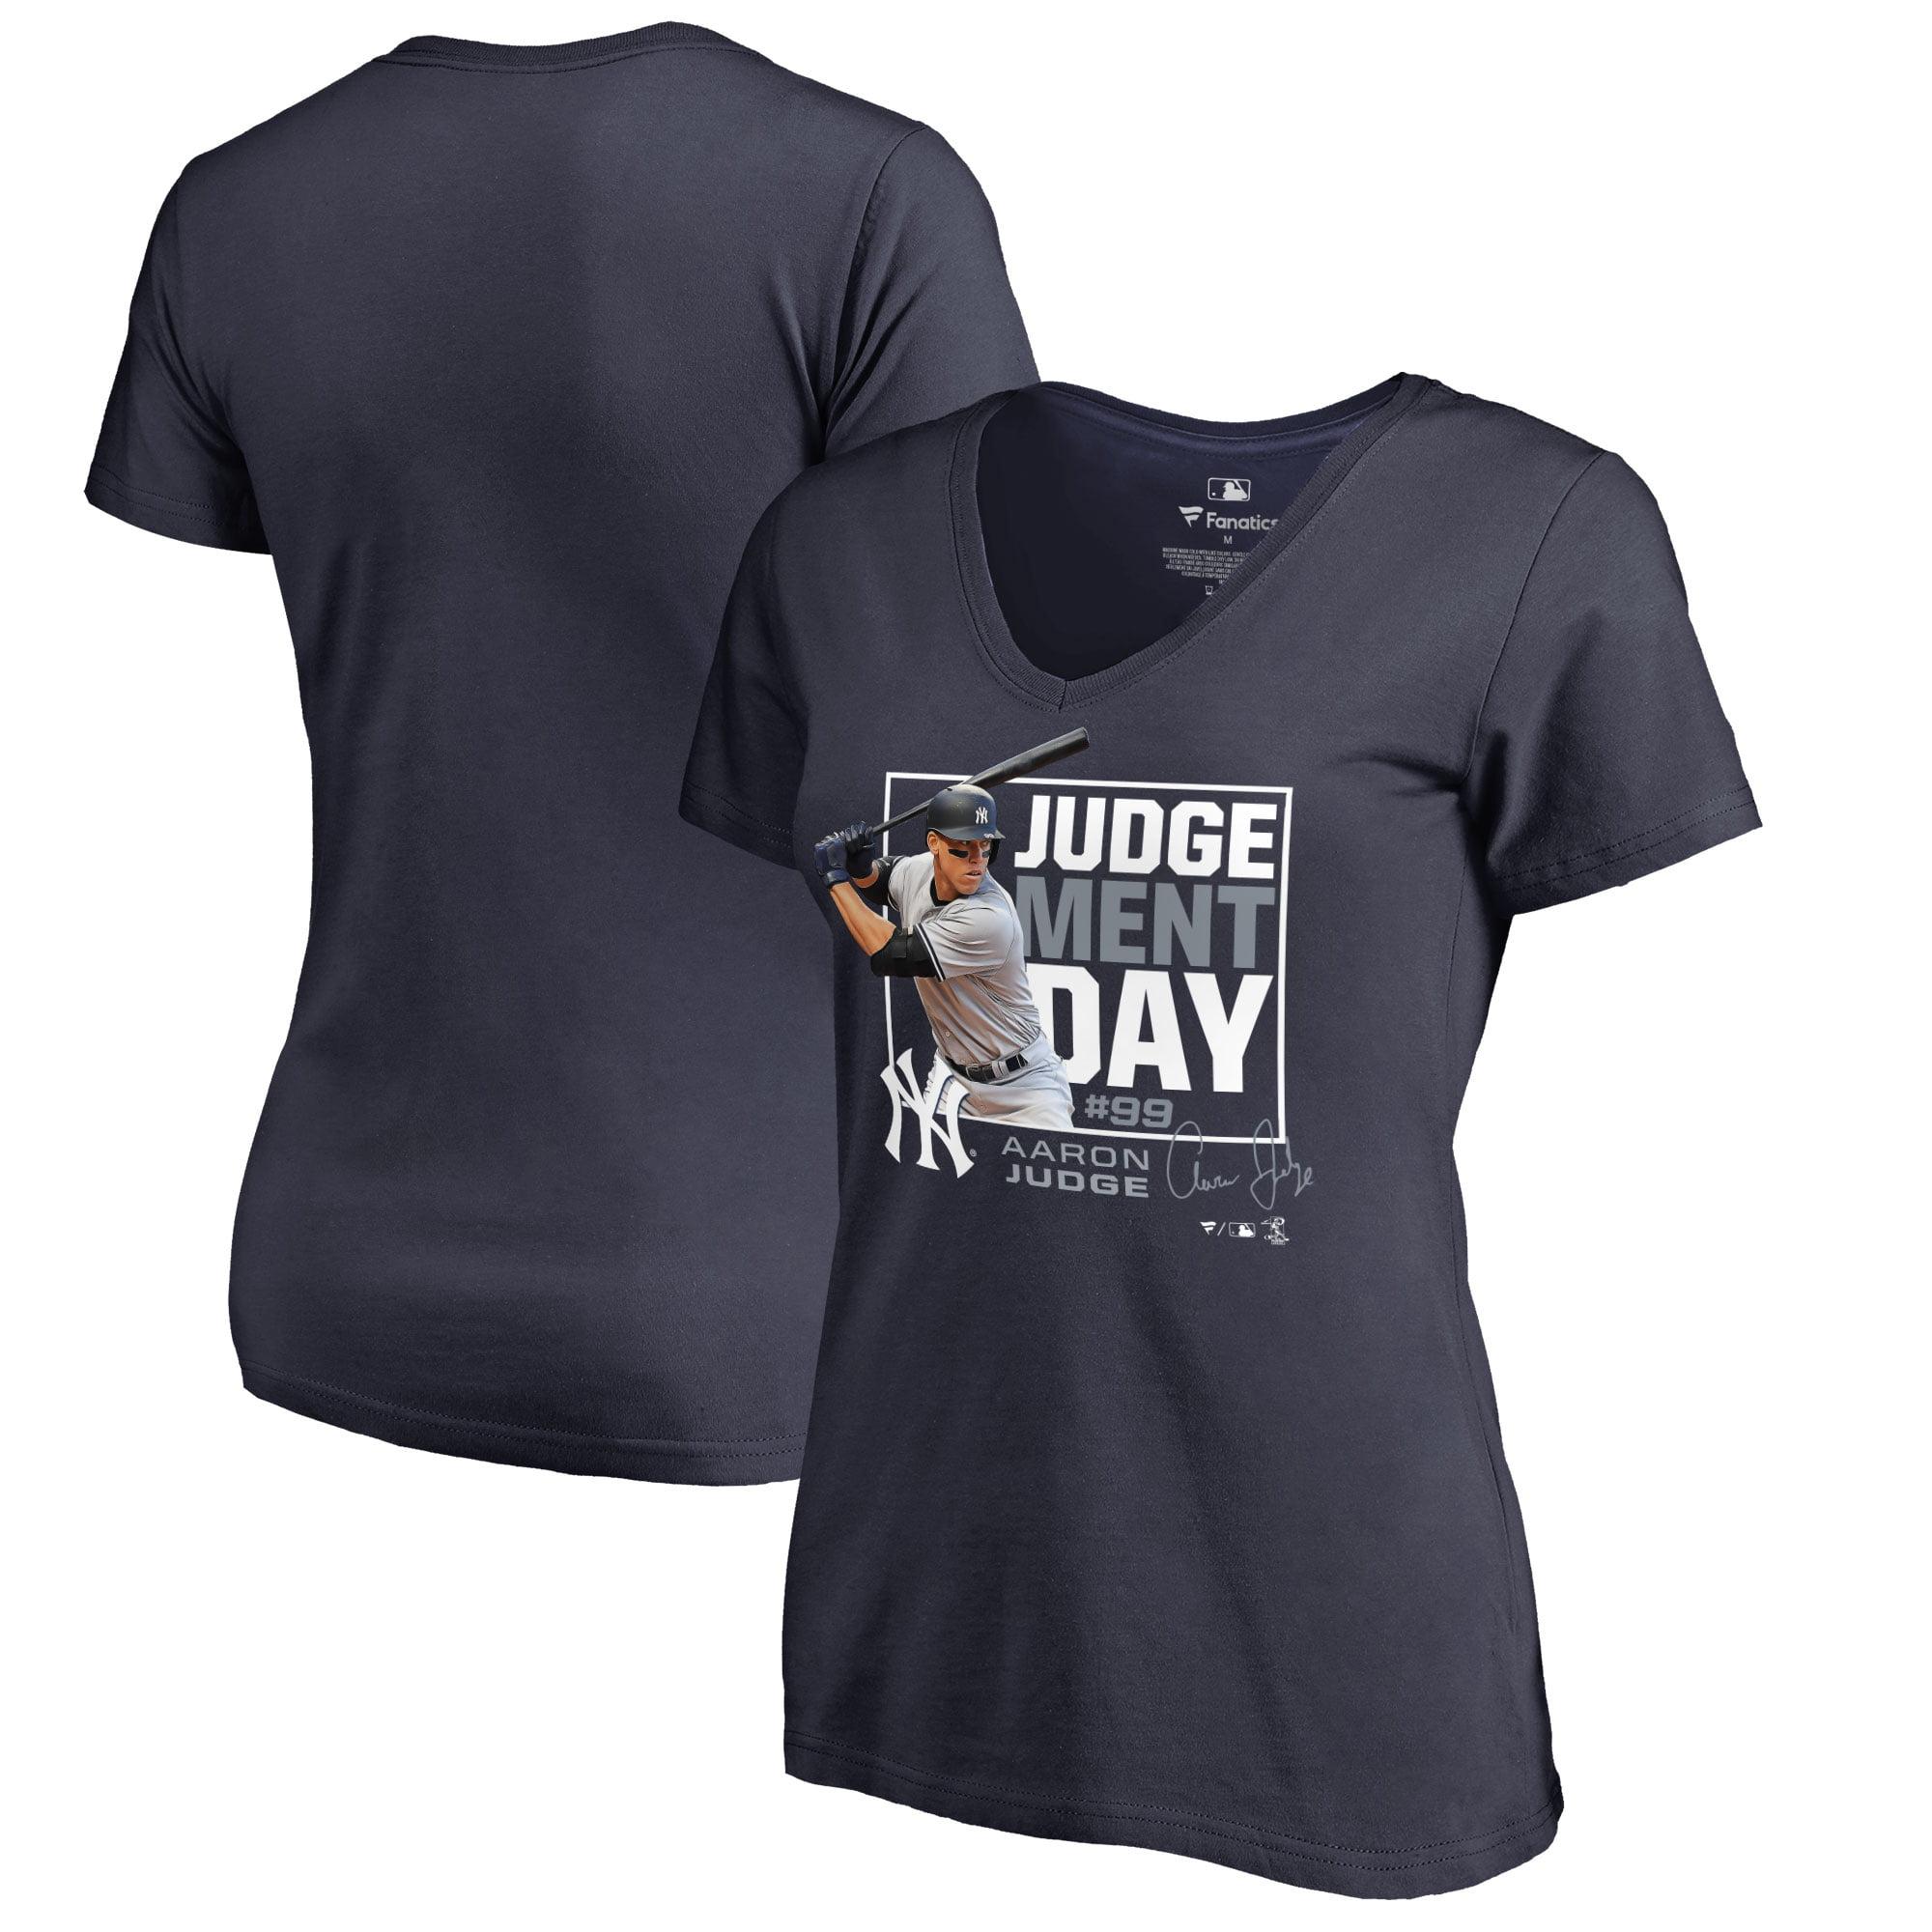 Aaron Judge New York Yankees Fanatics Branded Women s Judgement Day V-Neck  T-Shirt - Navy - Walmart.com 9ab4402c976